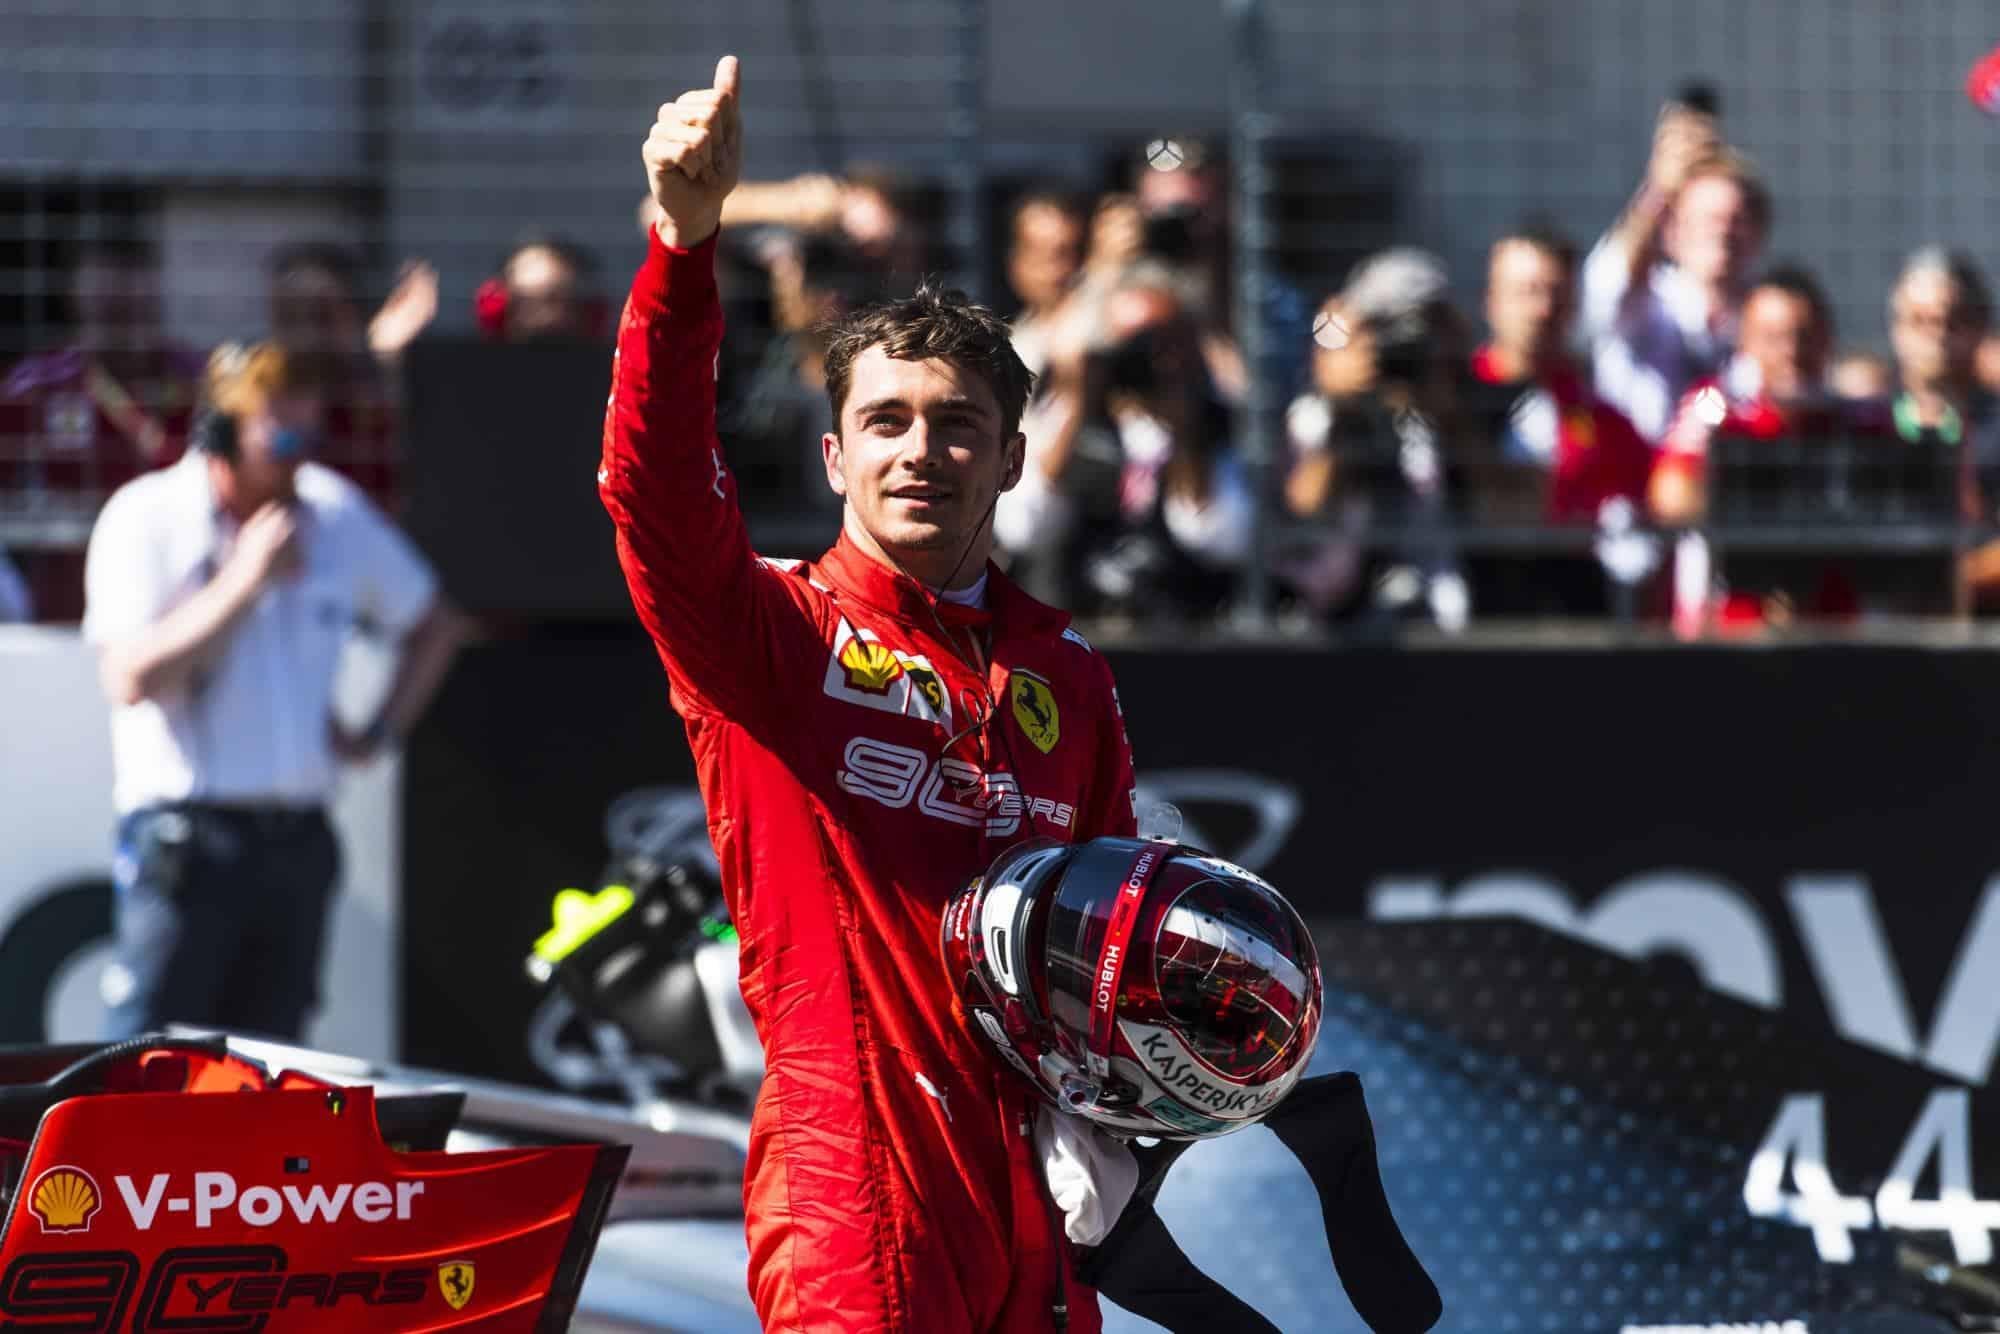 Charles Leclerc Ferrari SF90 Austrian GP F1 2019 celebrating pole Photo Ferrari